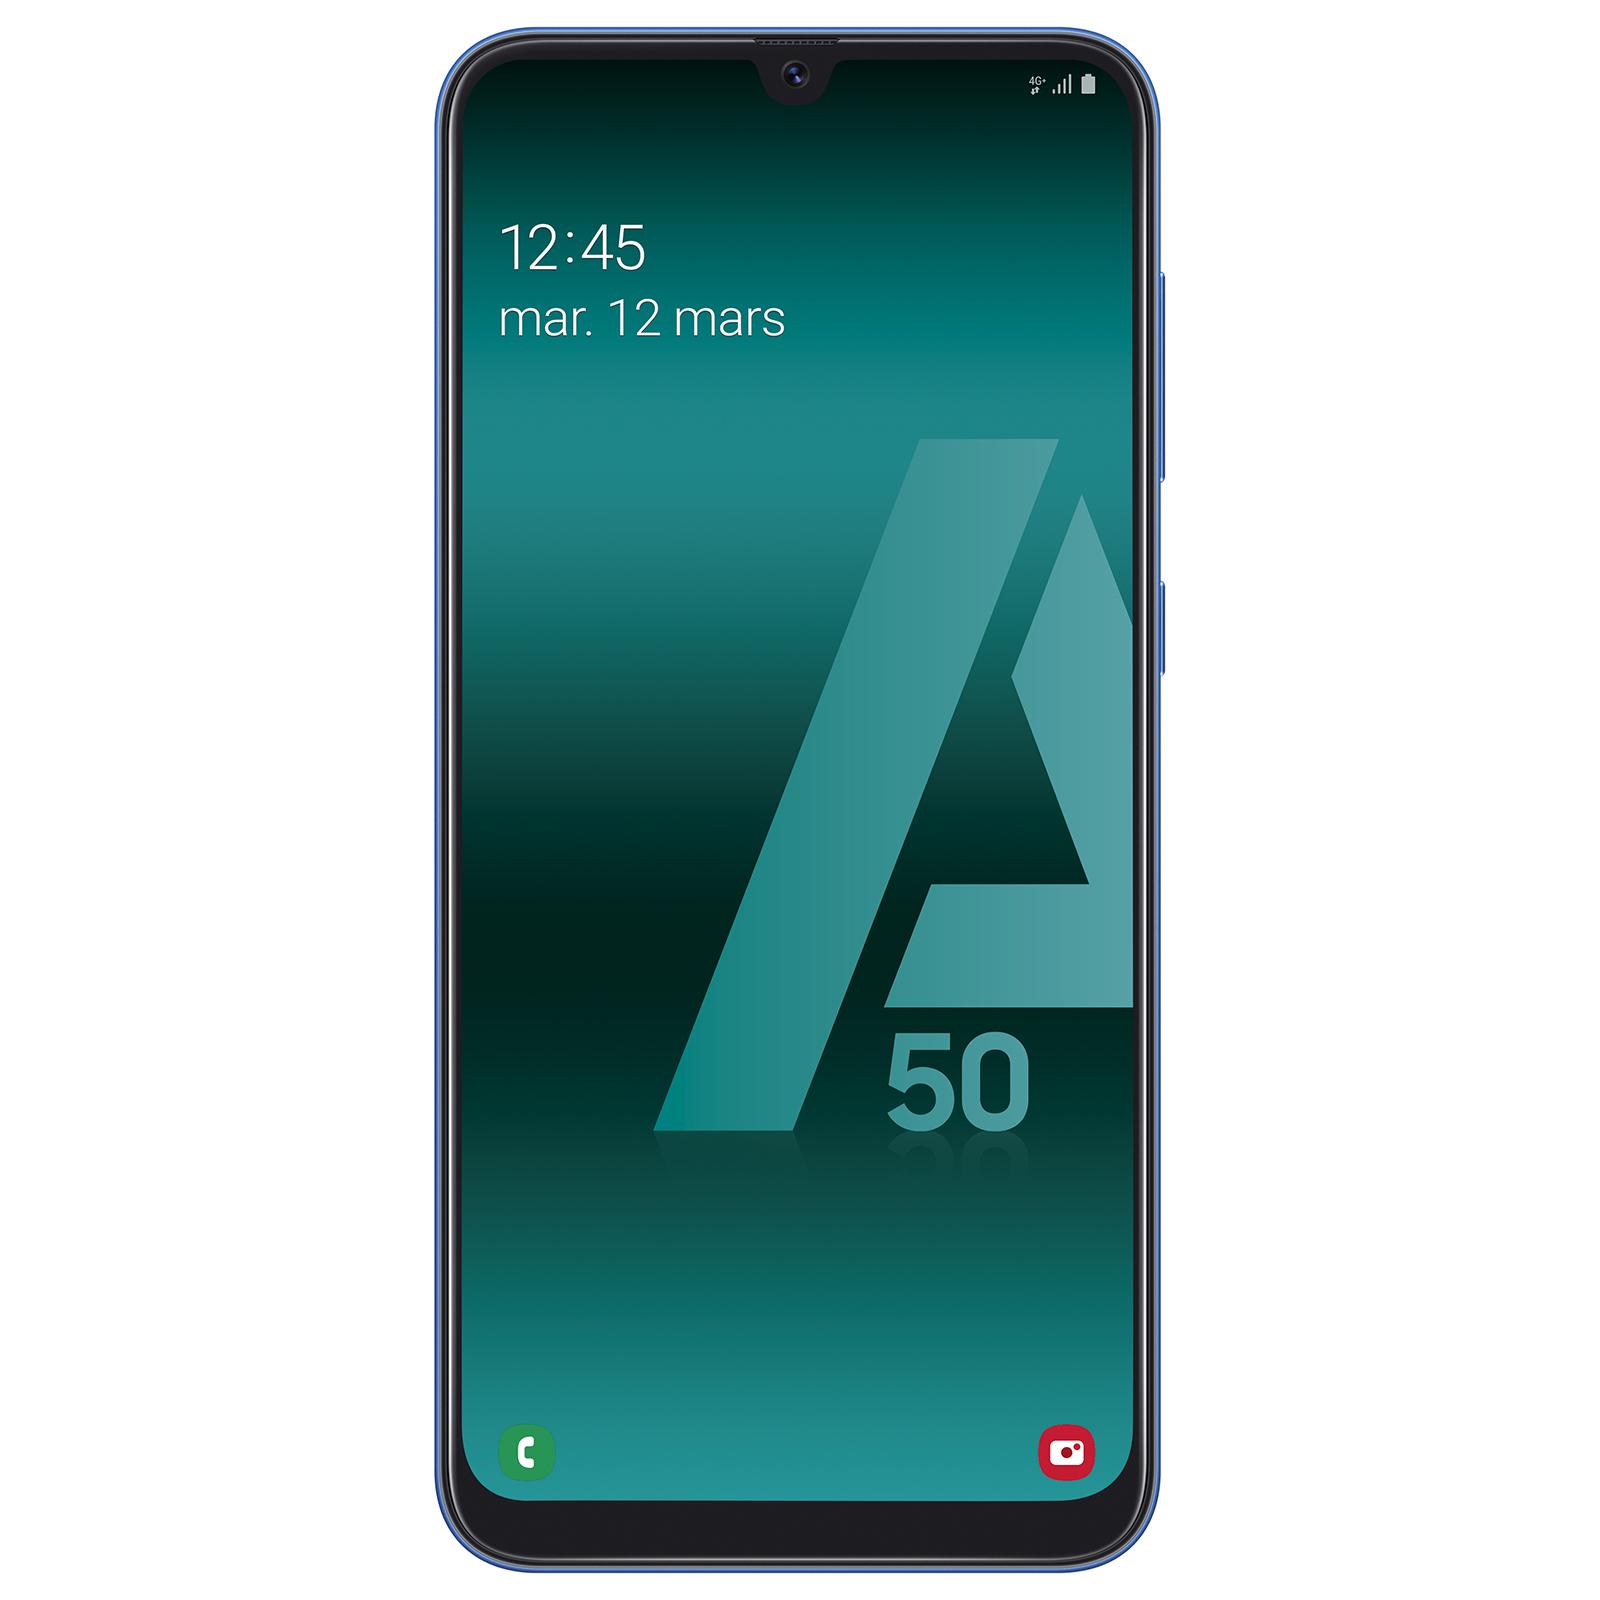 "Mobile & smartphone Samsung Galaxy A50 Bleu Smartphone 4G-LTE Dual SIM - Exynos 9610 8-Core 2.3 Ghz - RAM 4 Go - Ecran tactile Super AMOLED 6.4"" 1080 x 2340 - 128 Go - NFC/Bluetooth 5.0 - 4000 mAh - Android 9.0"